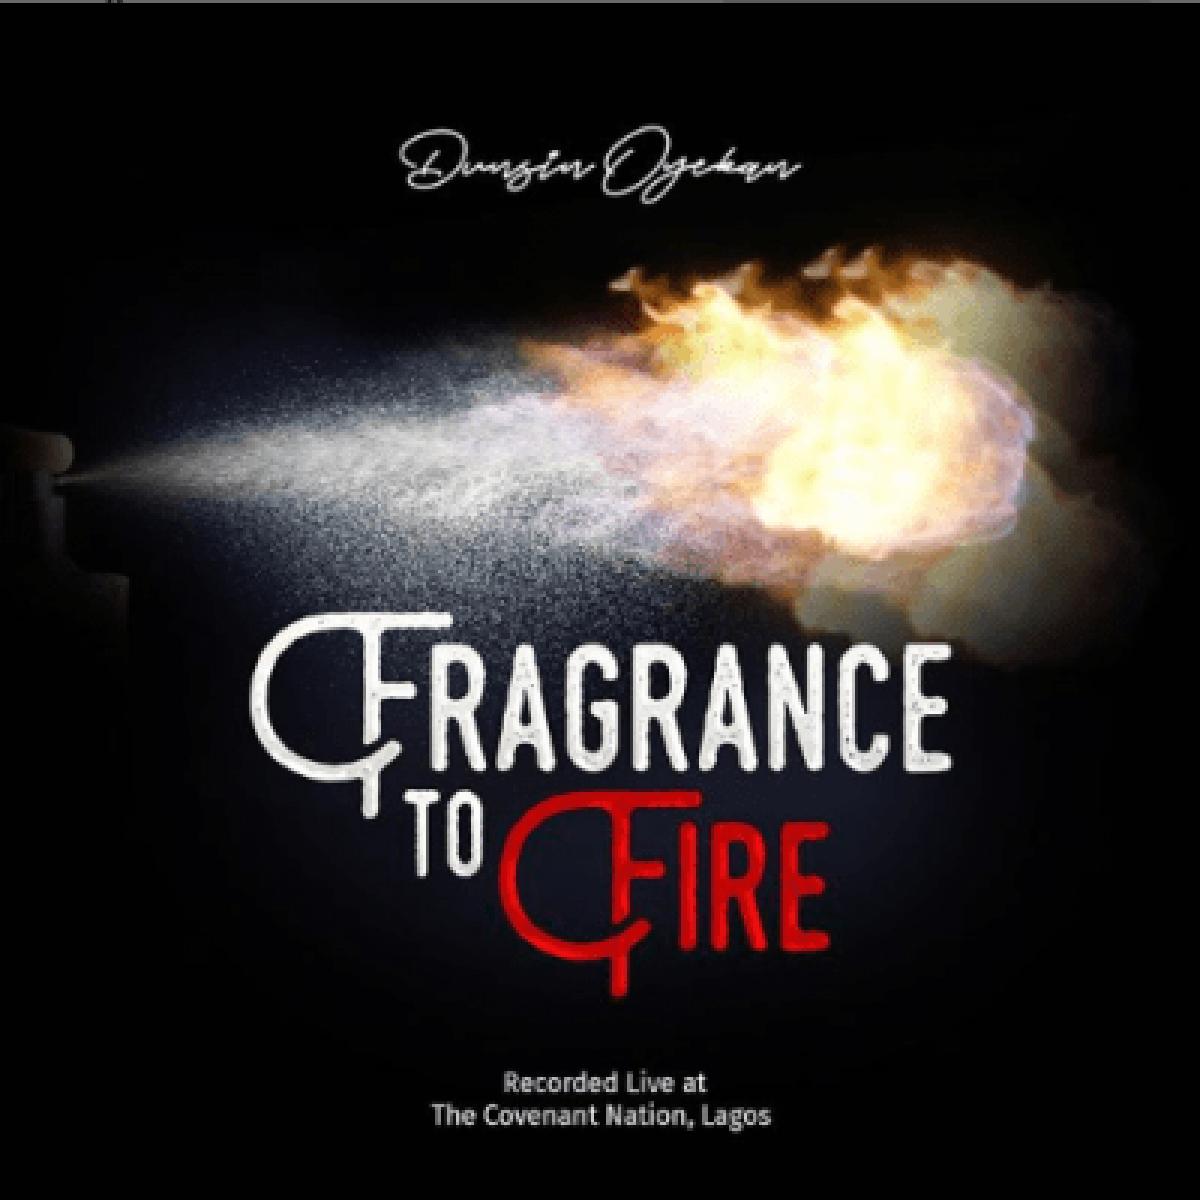 Download Dunsin Oyekan Fragrance To Fire Mp3 Lyrics Video Jesusful